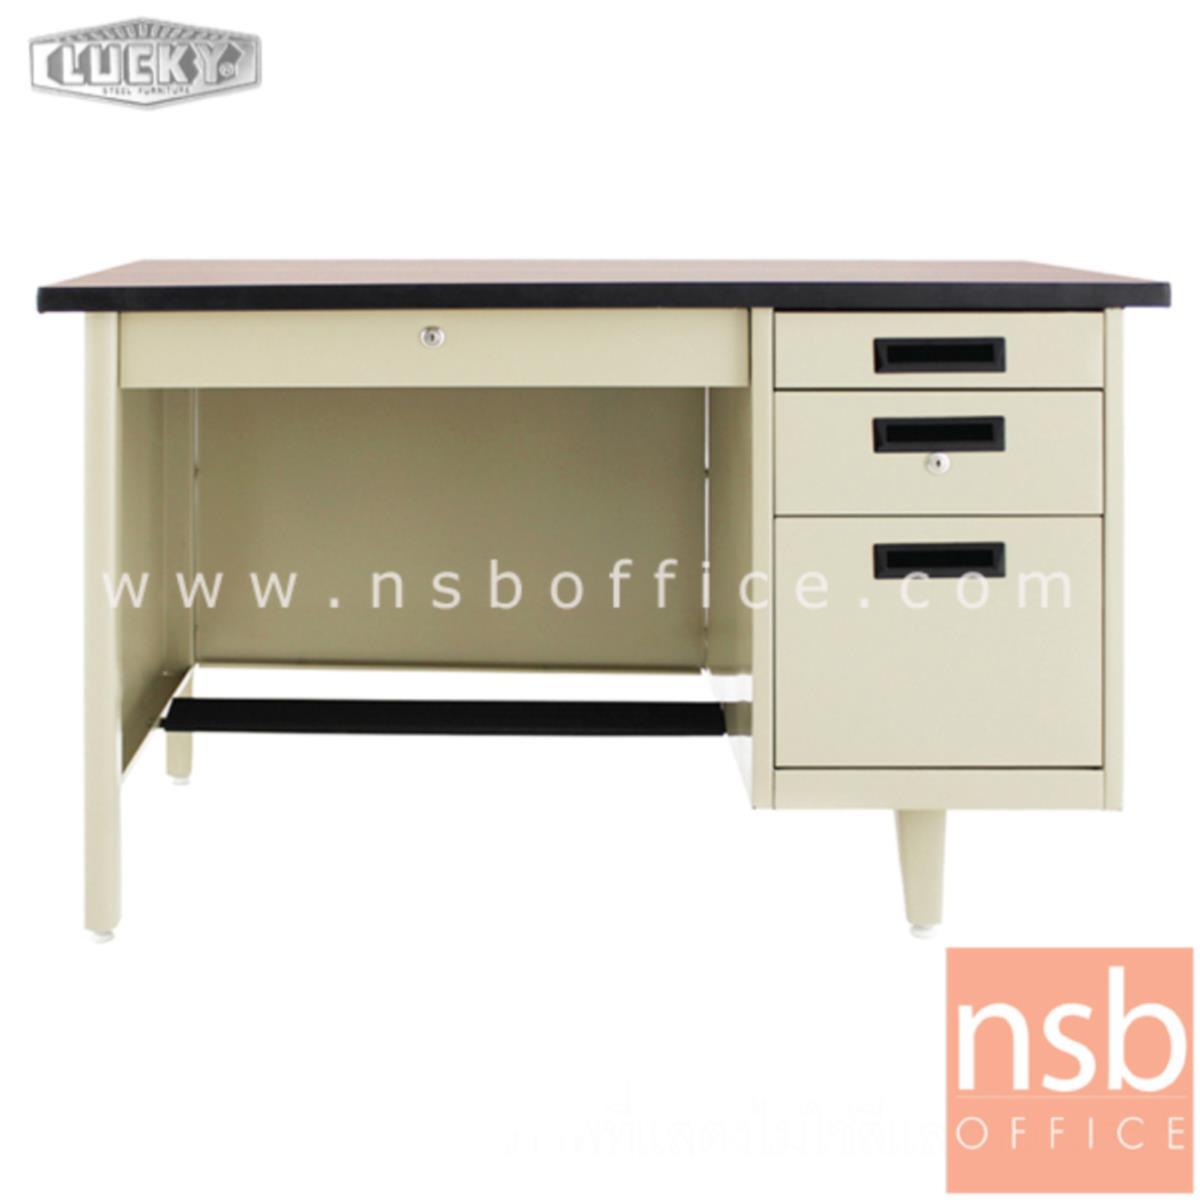 E28A100:โต๊ะทำงานเหล็กหน้าโฟเมก้าลายไม้ 4 ลิ้นชัก ยี่ห้อ Lucky  รุ่น NT-2436,NT-2642,NT-2648